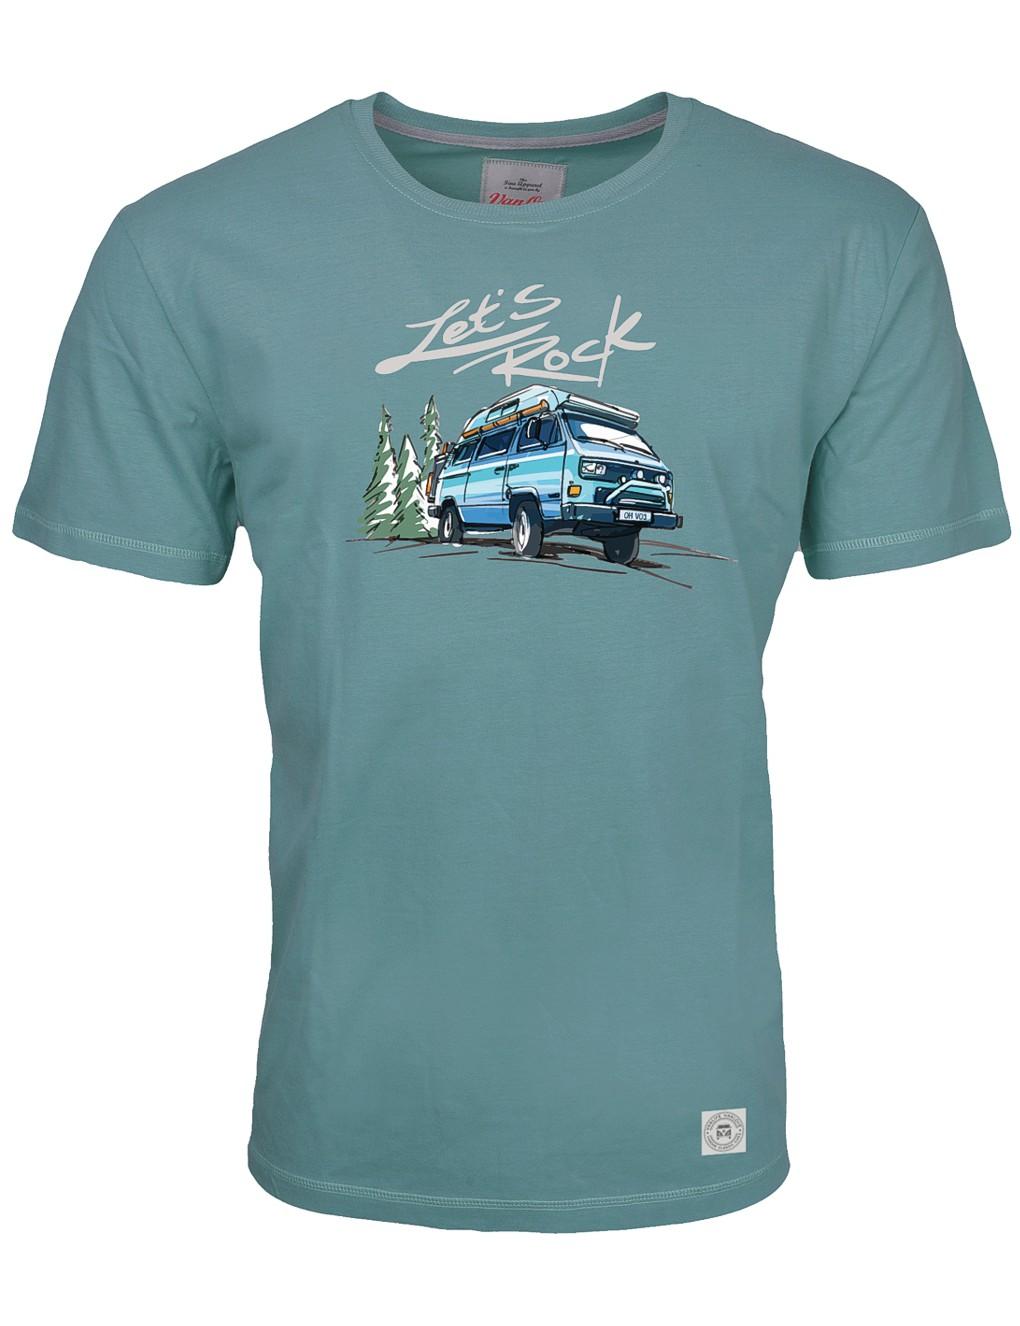 Herren T-Shirt VW Bulli »LETS ROCK« Petrol